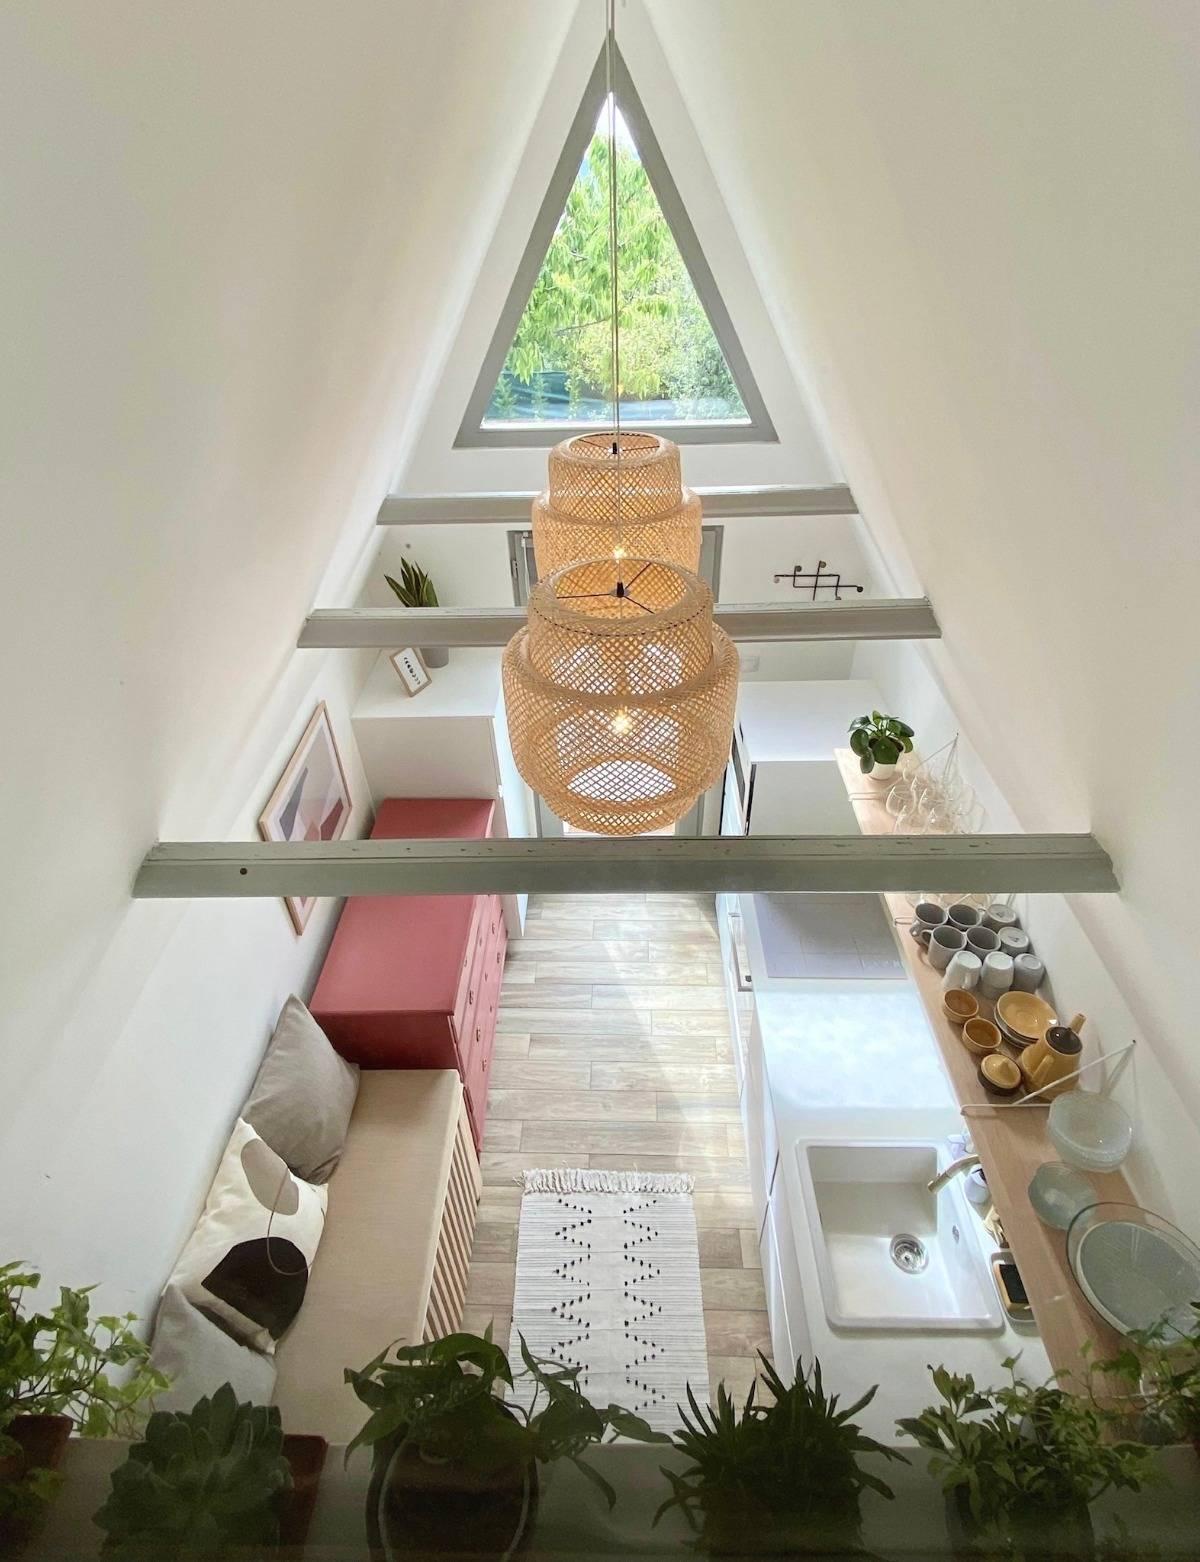 konyha, kabin, szürke konyha, szőnyeg